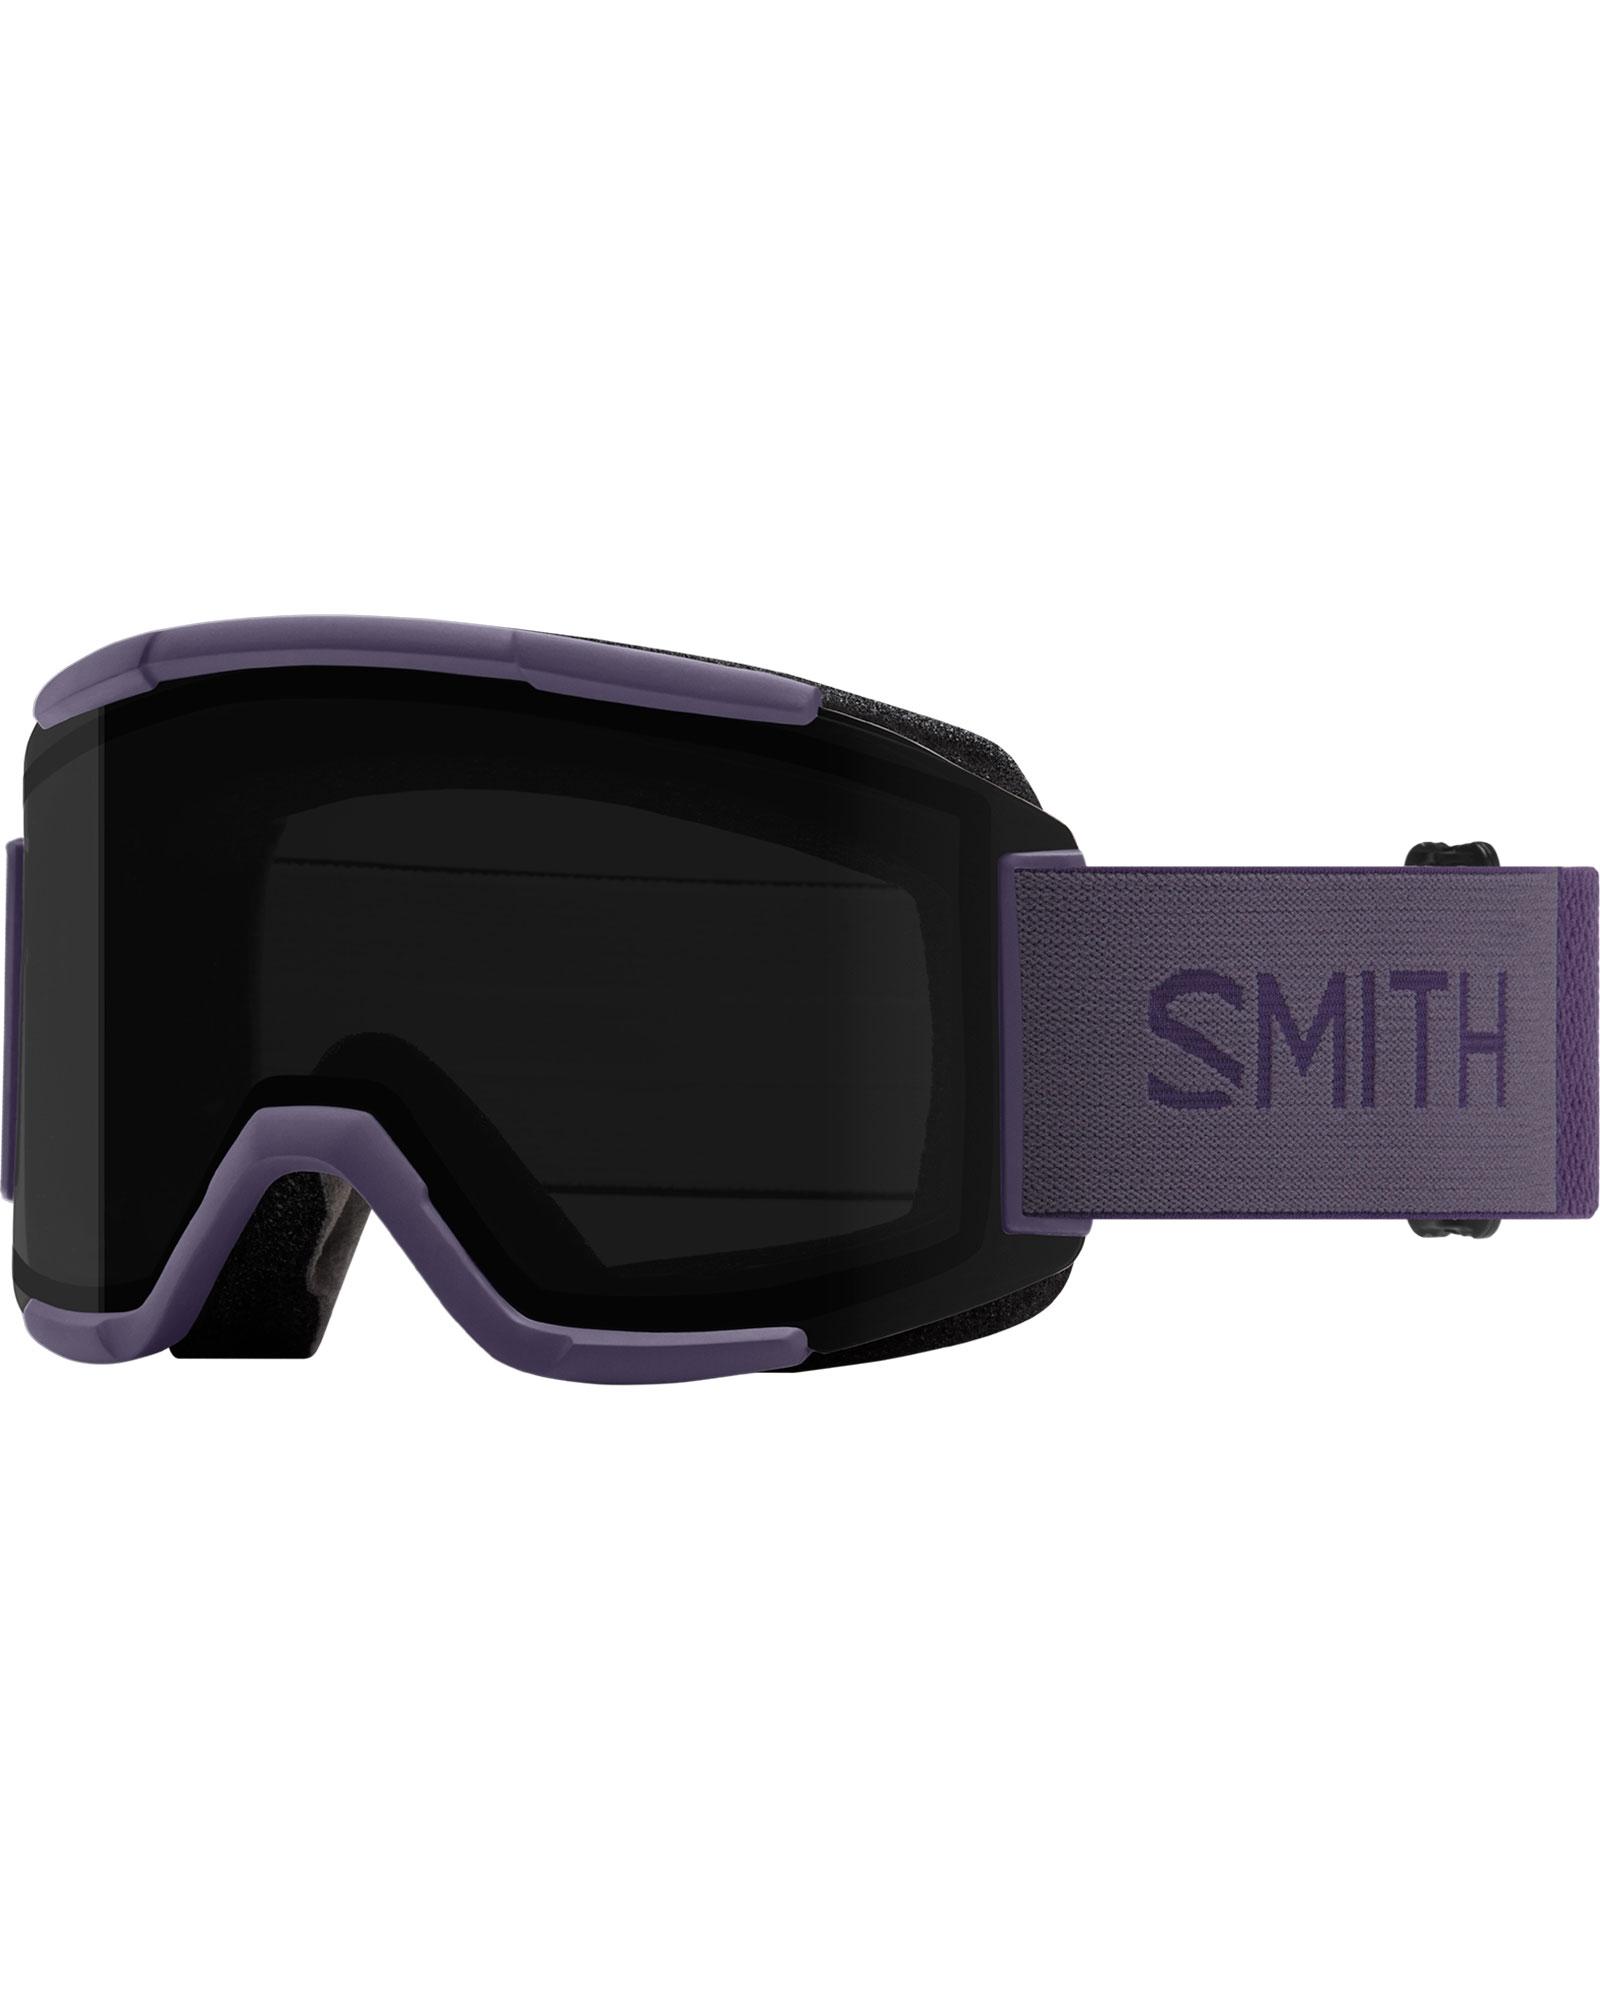 Smith Vantage Mips Helmet 2017 / 2018